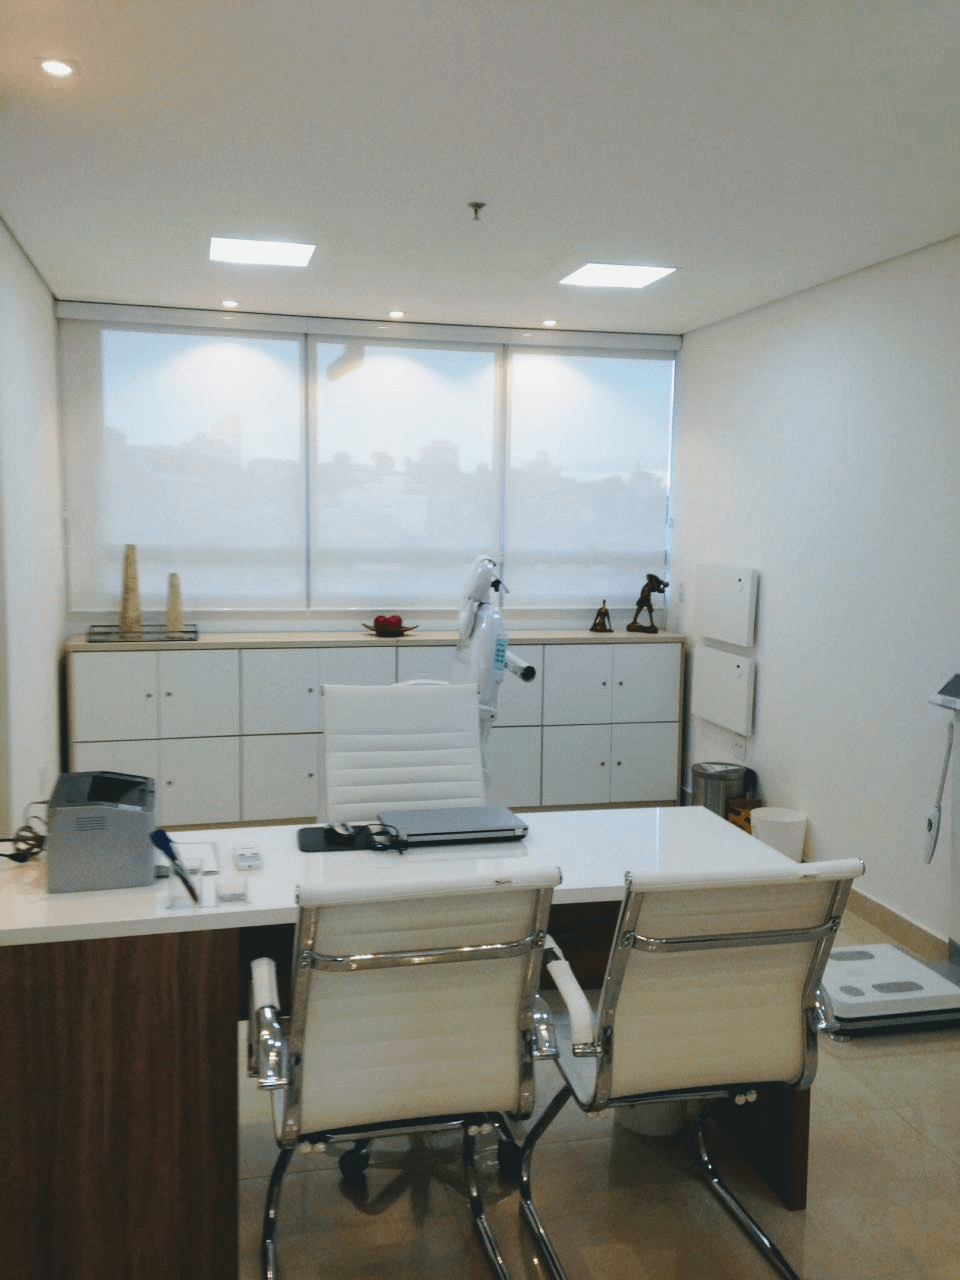 consultorio dra vanessa londe belo horizonte (1)